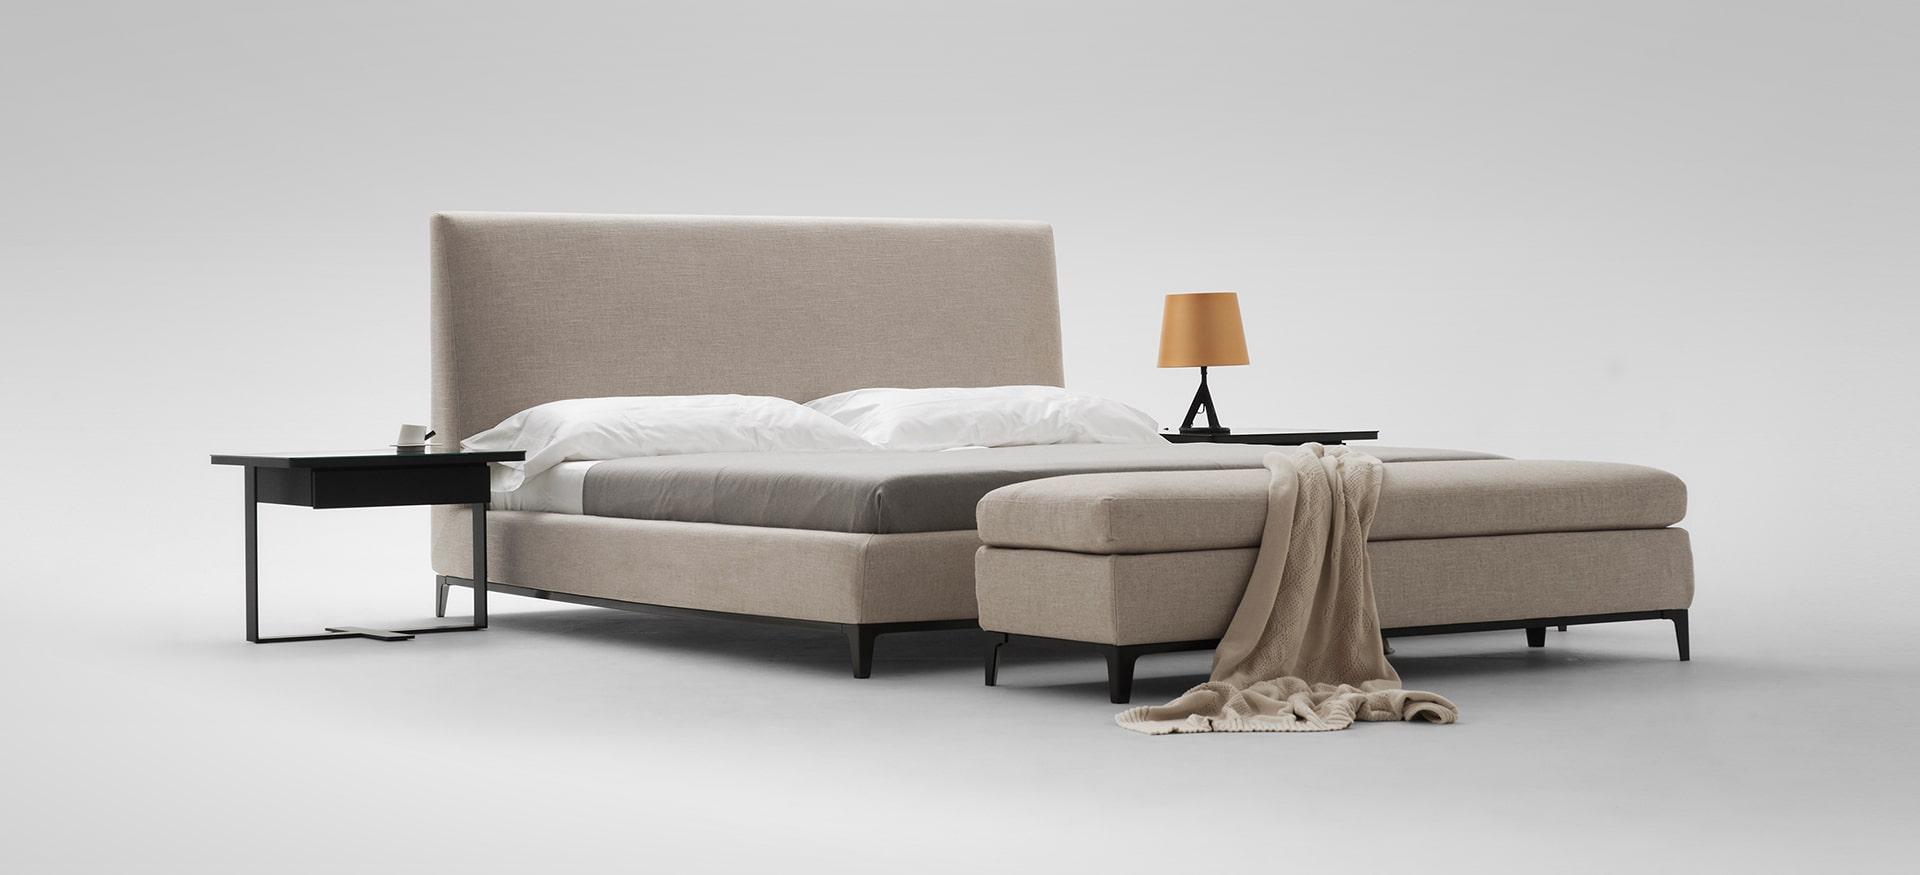 Crescent Bed